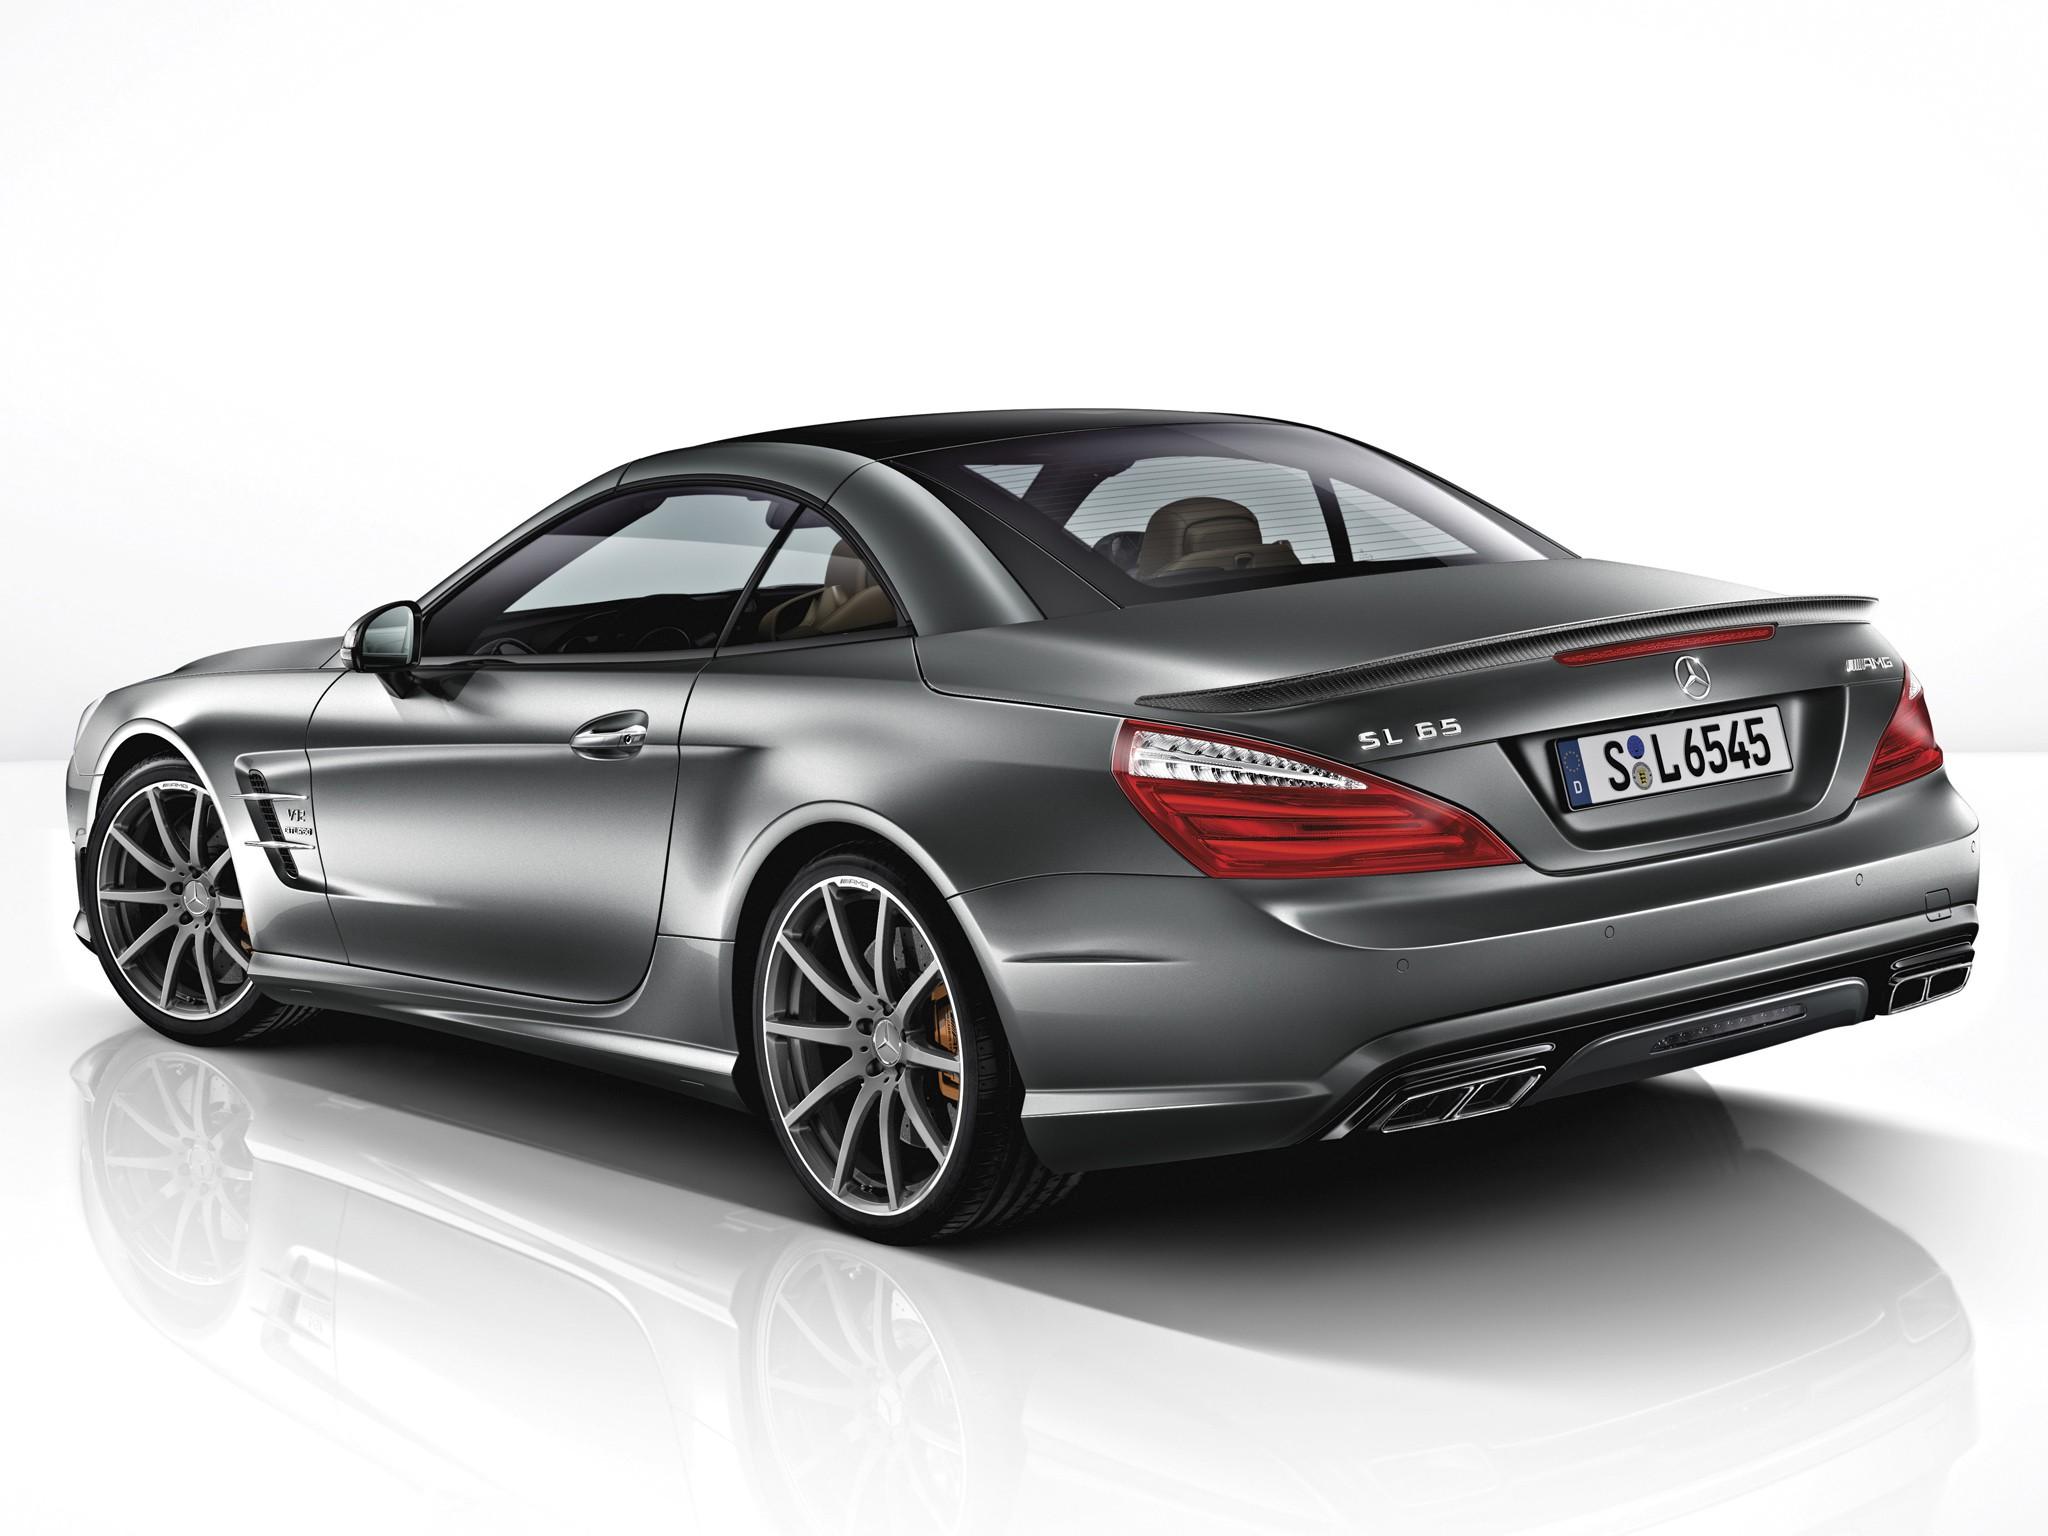 Mercedes benz sl 65 amg r231 2012 2013 2014 2015 for Amg mercedes benz